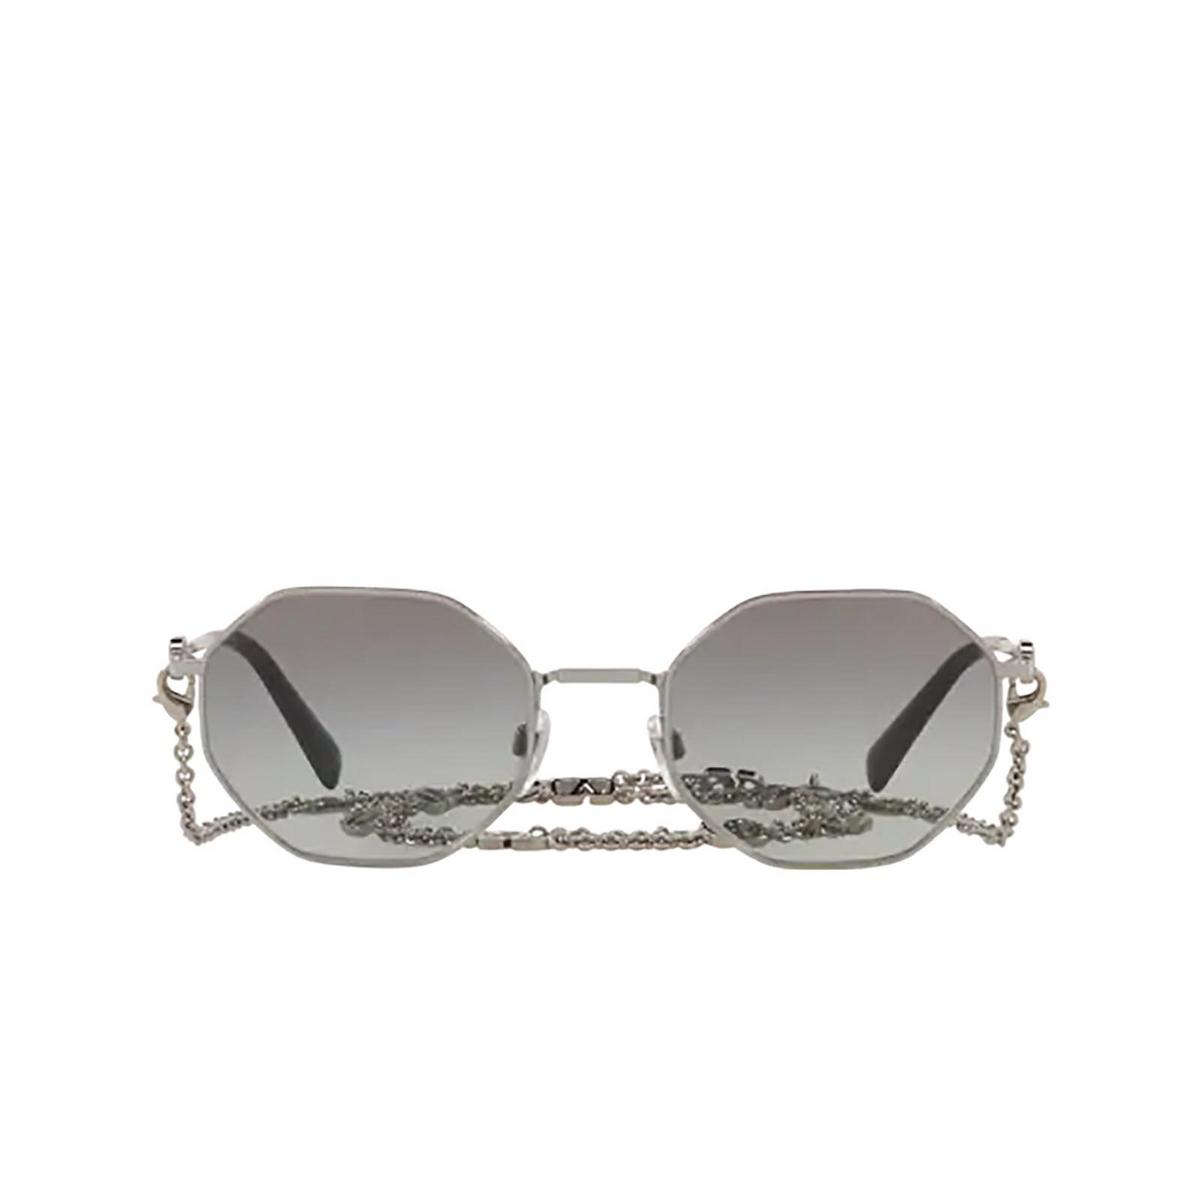 Valentino® Irregular Sunglasses: VA2040 color Gunmetal 300511 - front view.